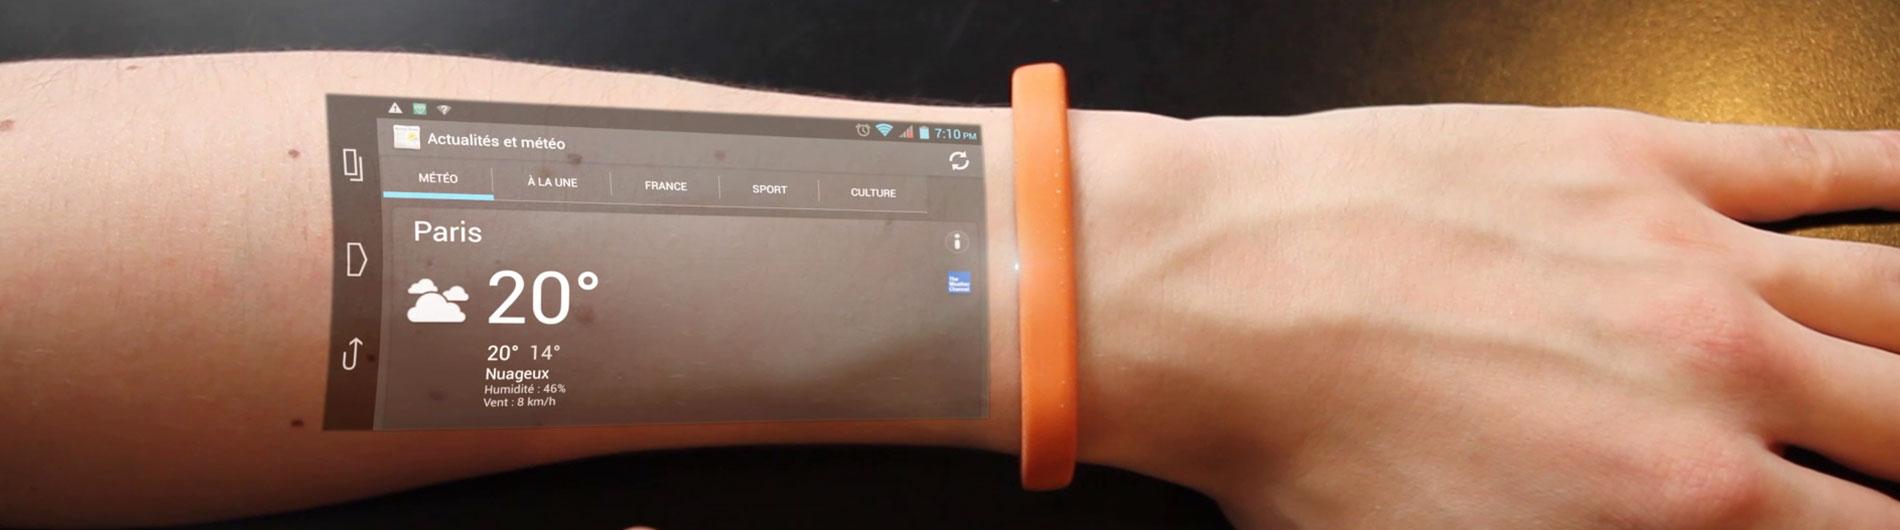 Wearables Replace Smartphones